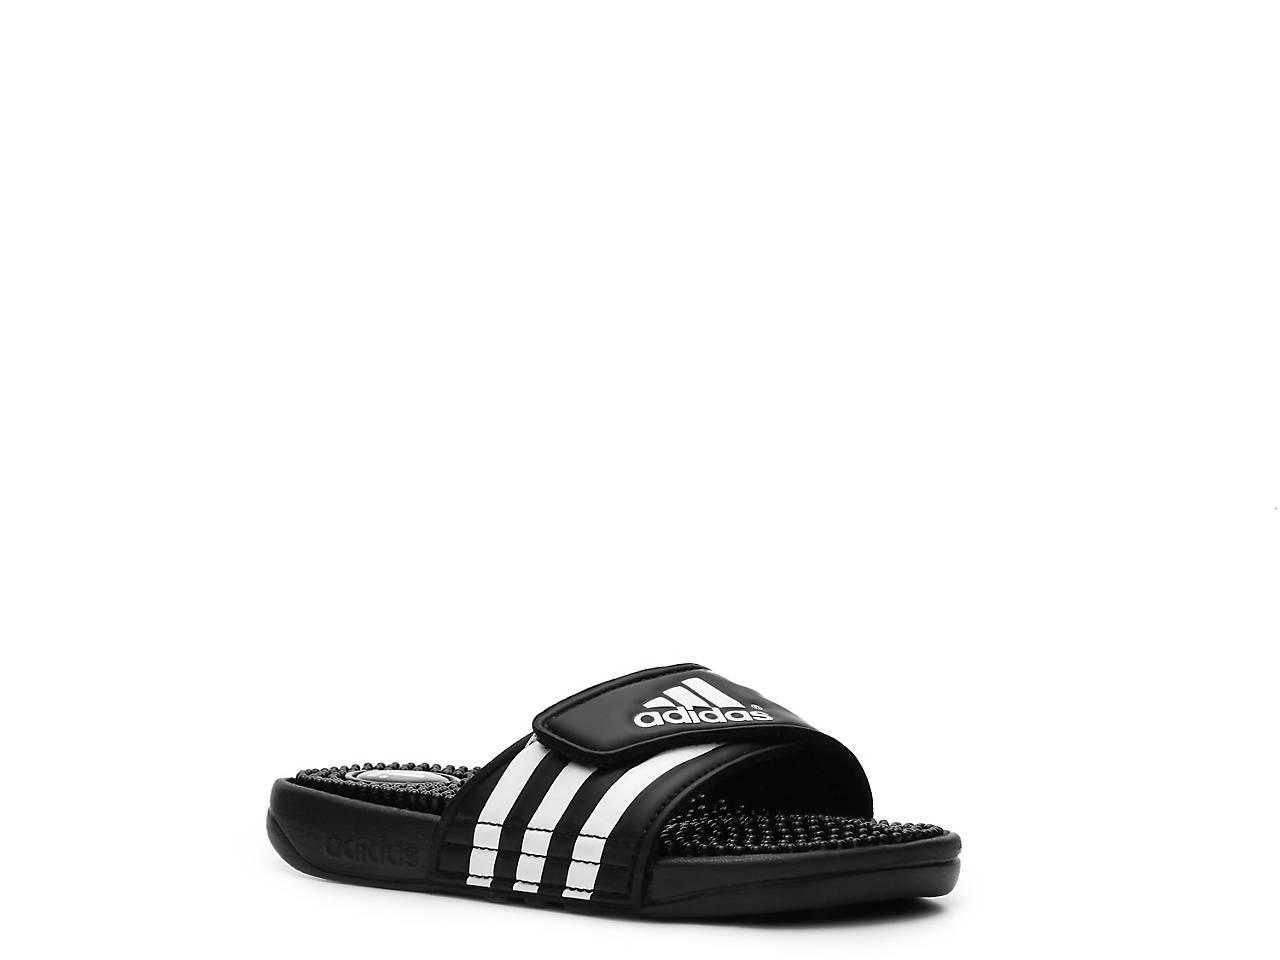 size 40 85852 23be8 adidas. Adissage Toddler  Youth Slide Sandal